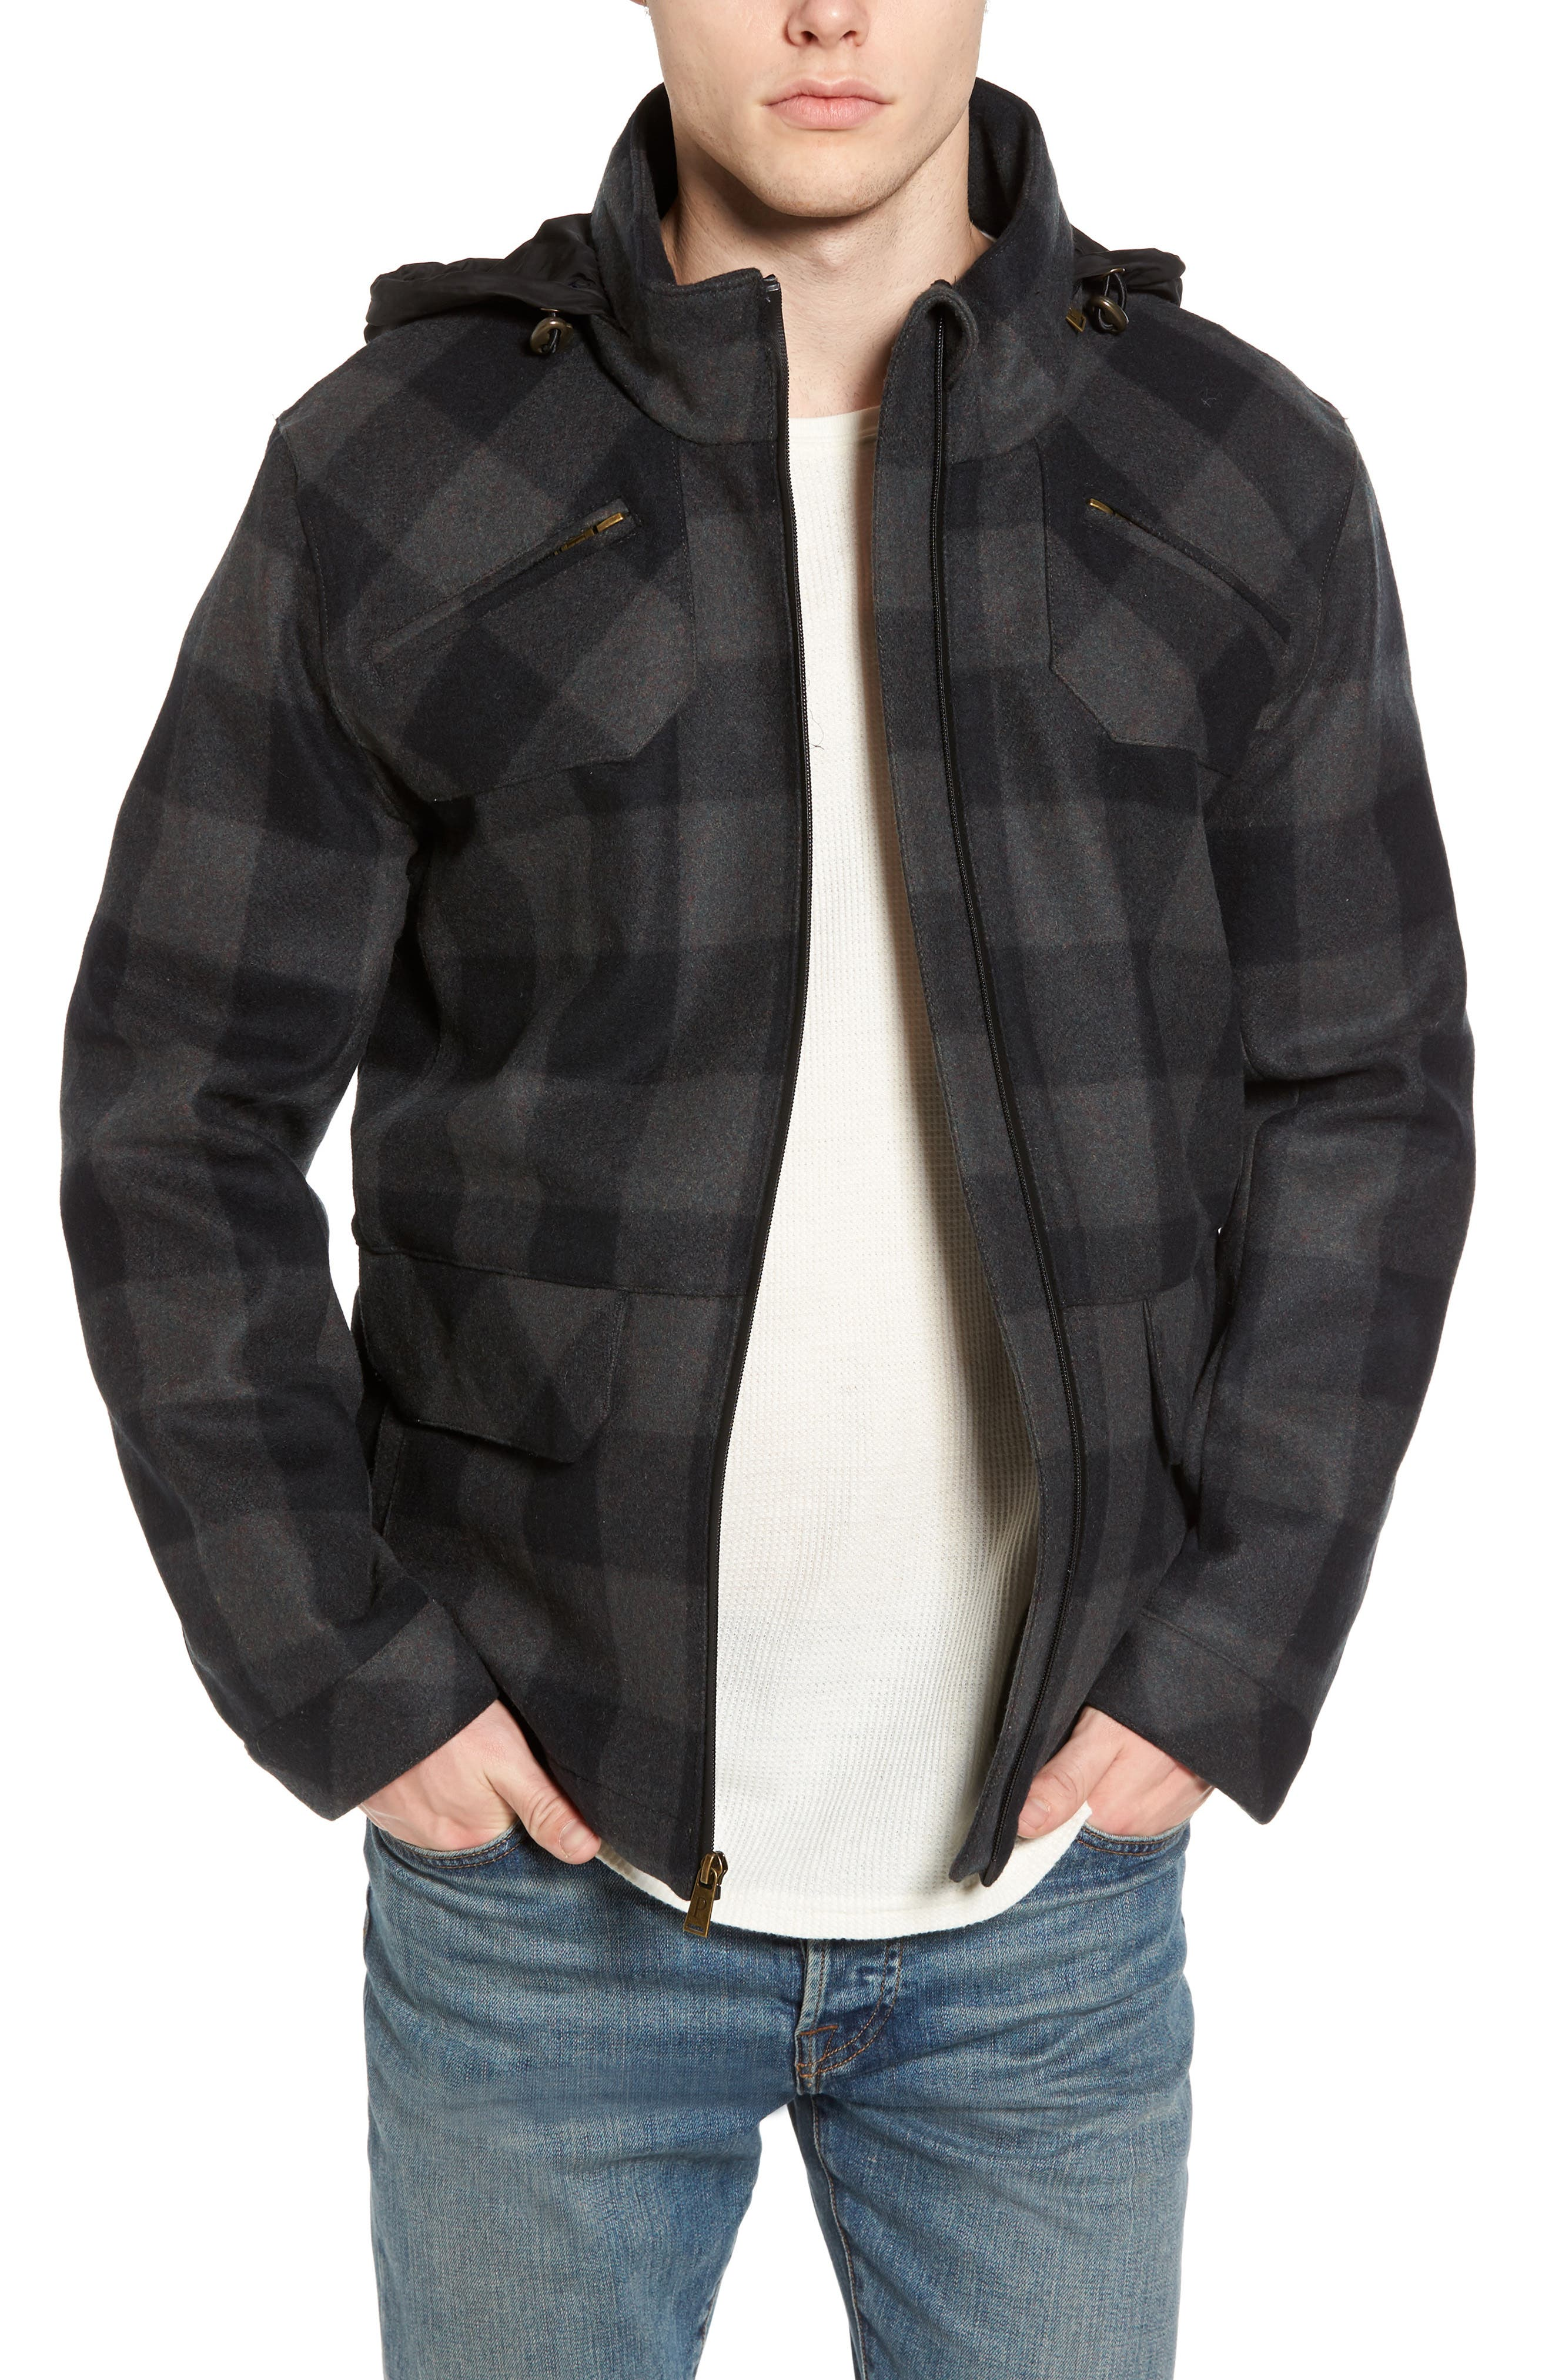 Pendleton Albuquerque Jacket